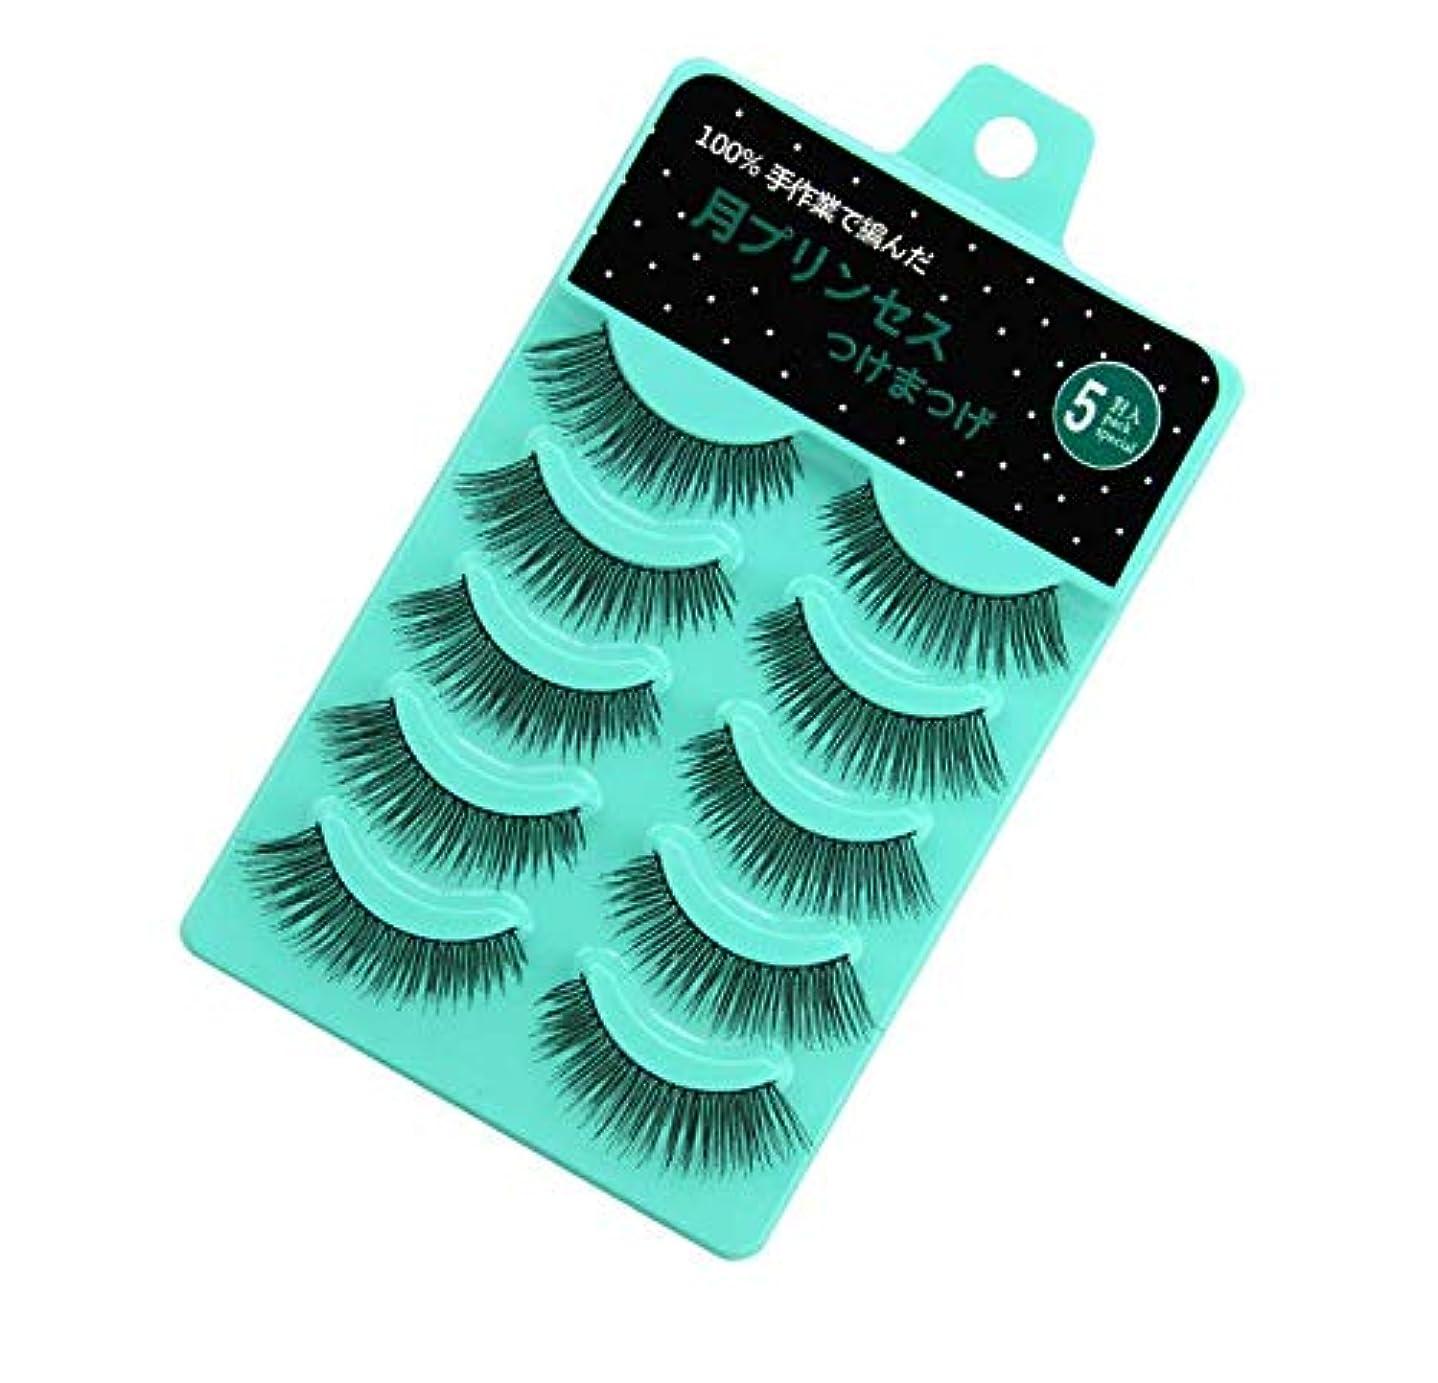 HNYYZL つけまつげ ミンクつけまつ毛 15ペア グラマラスボリュームアイラッシュ ふんわりロングまつ毛 極薄 濃密 超軽量 高級繊維